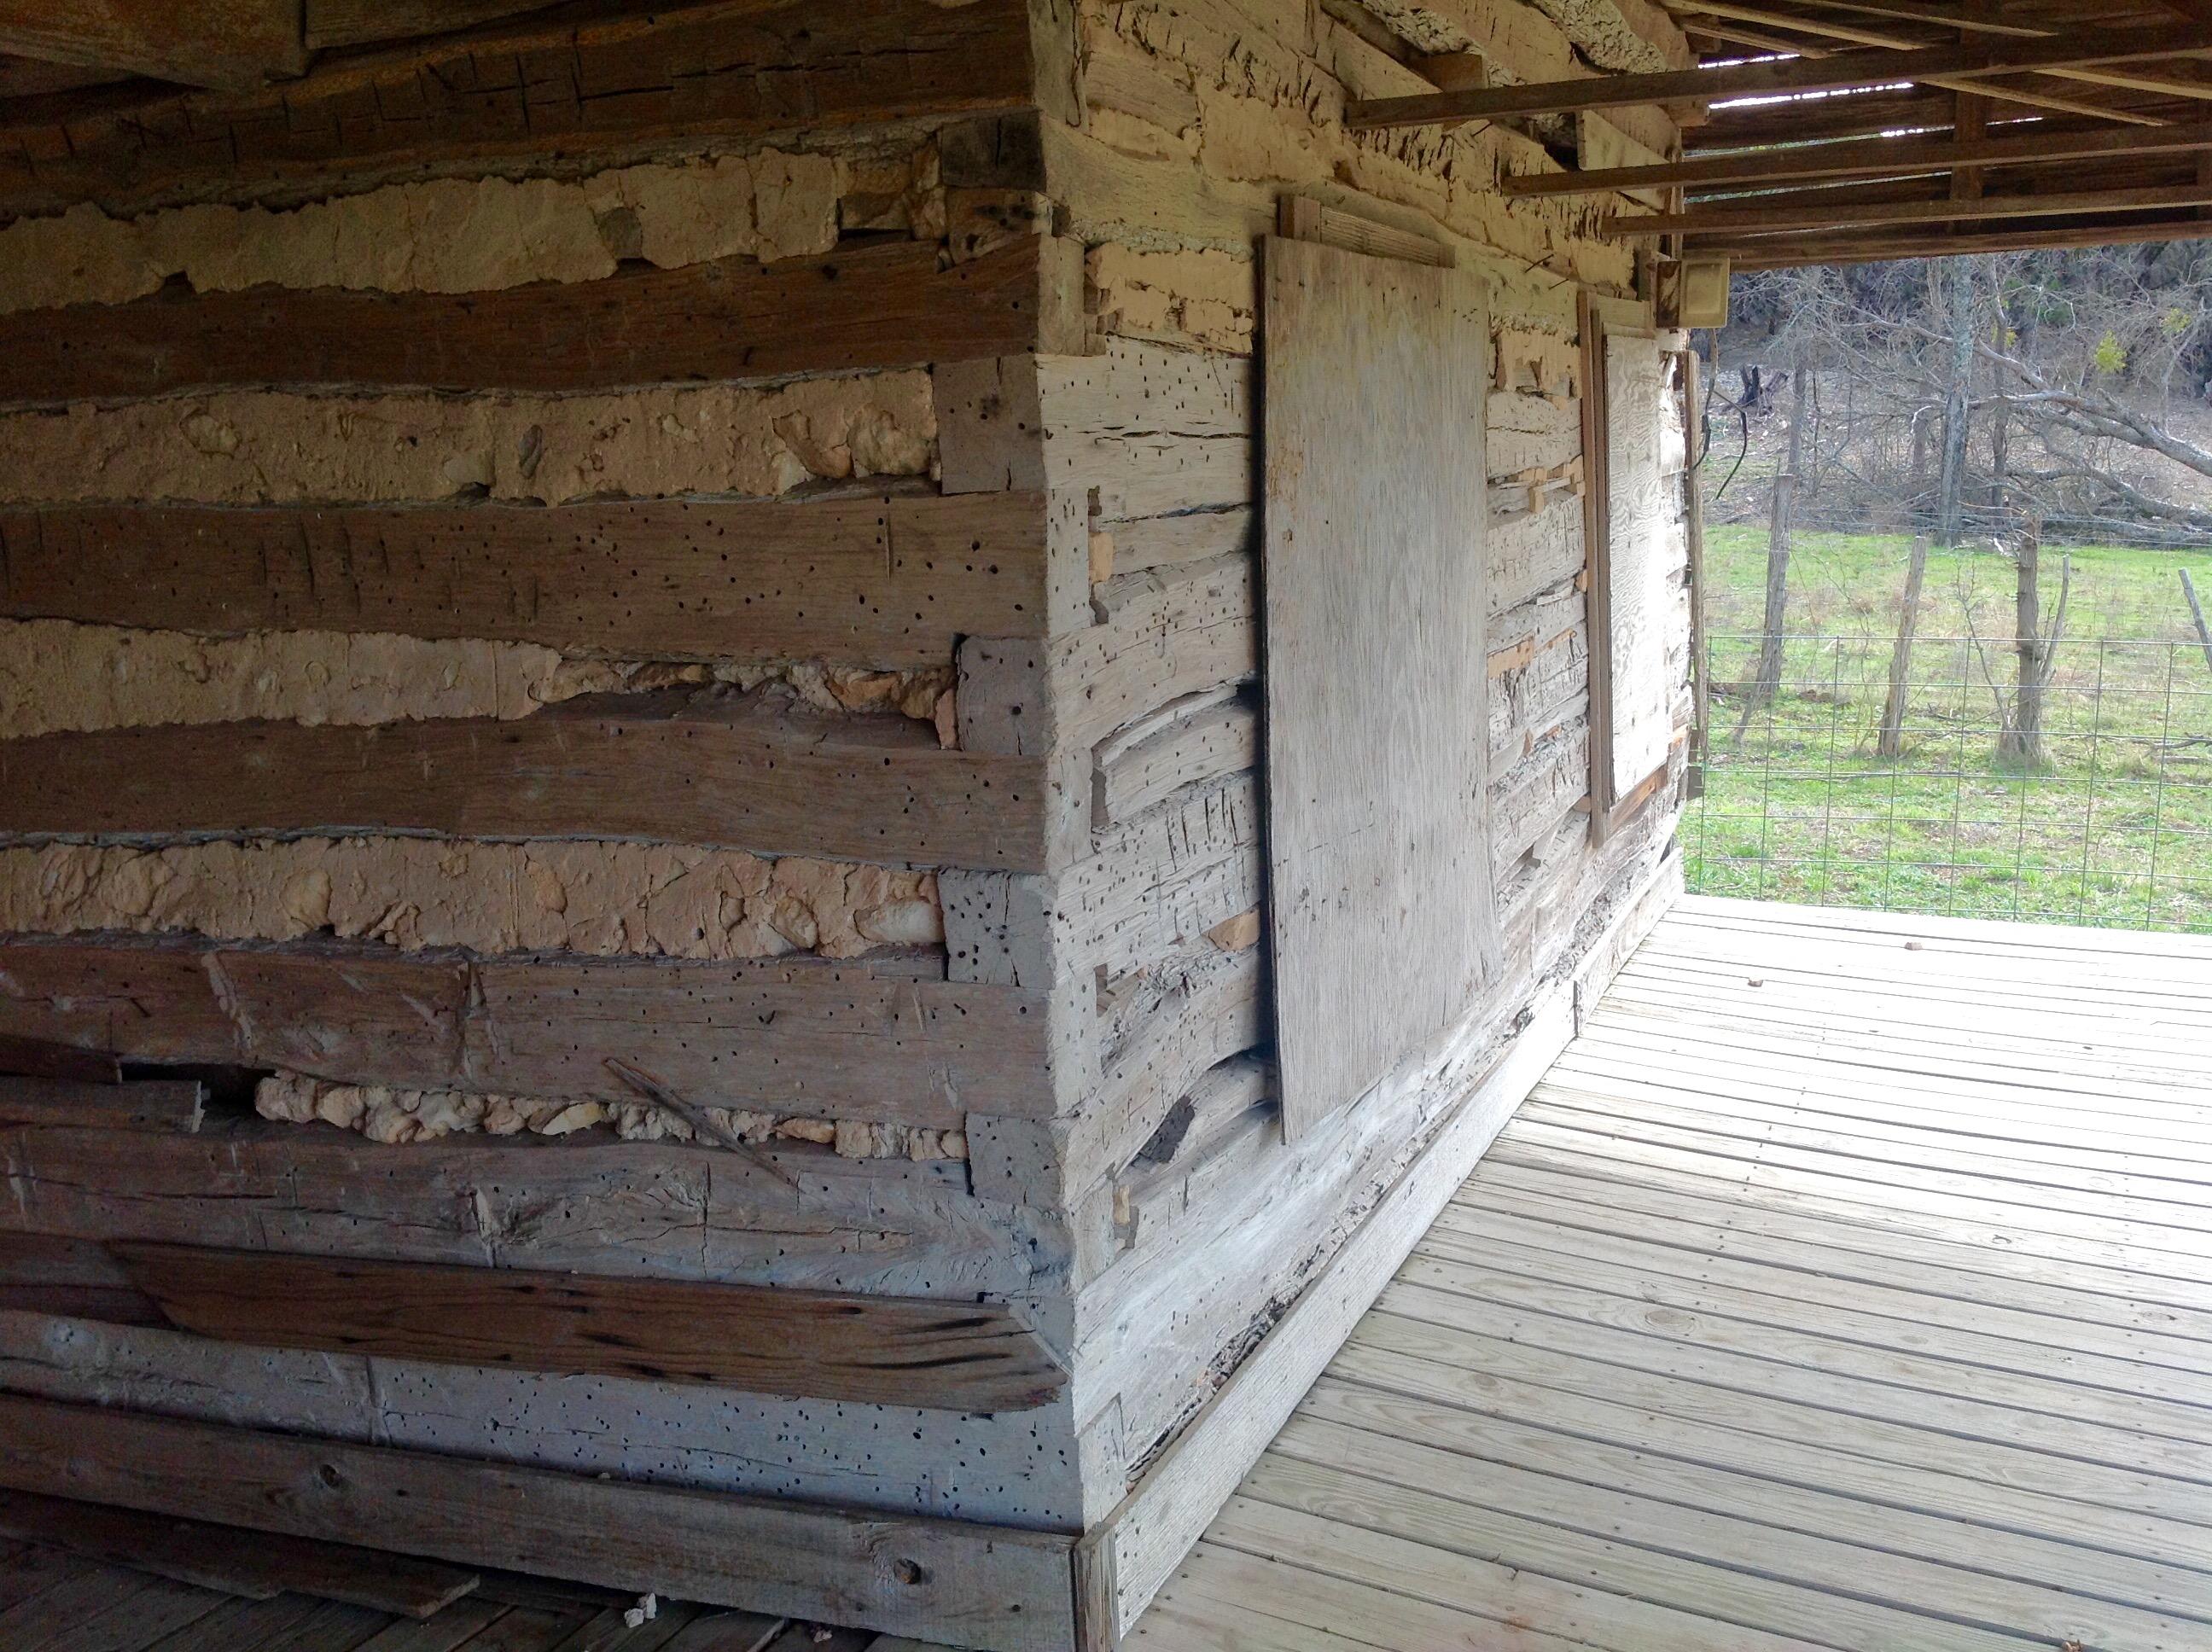 Texas Log Home Design, Historic Restoration Architect, Historic Rehabilitation Architect. Rustic Log Cabin Texas, Colorado, Oklahoma Architect Architecture Firm